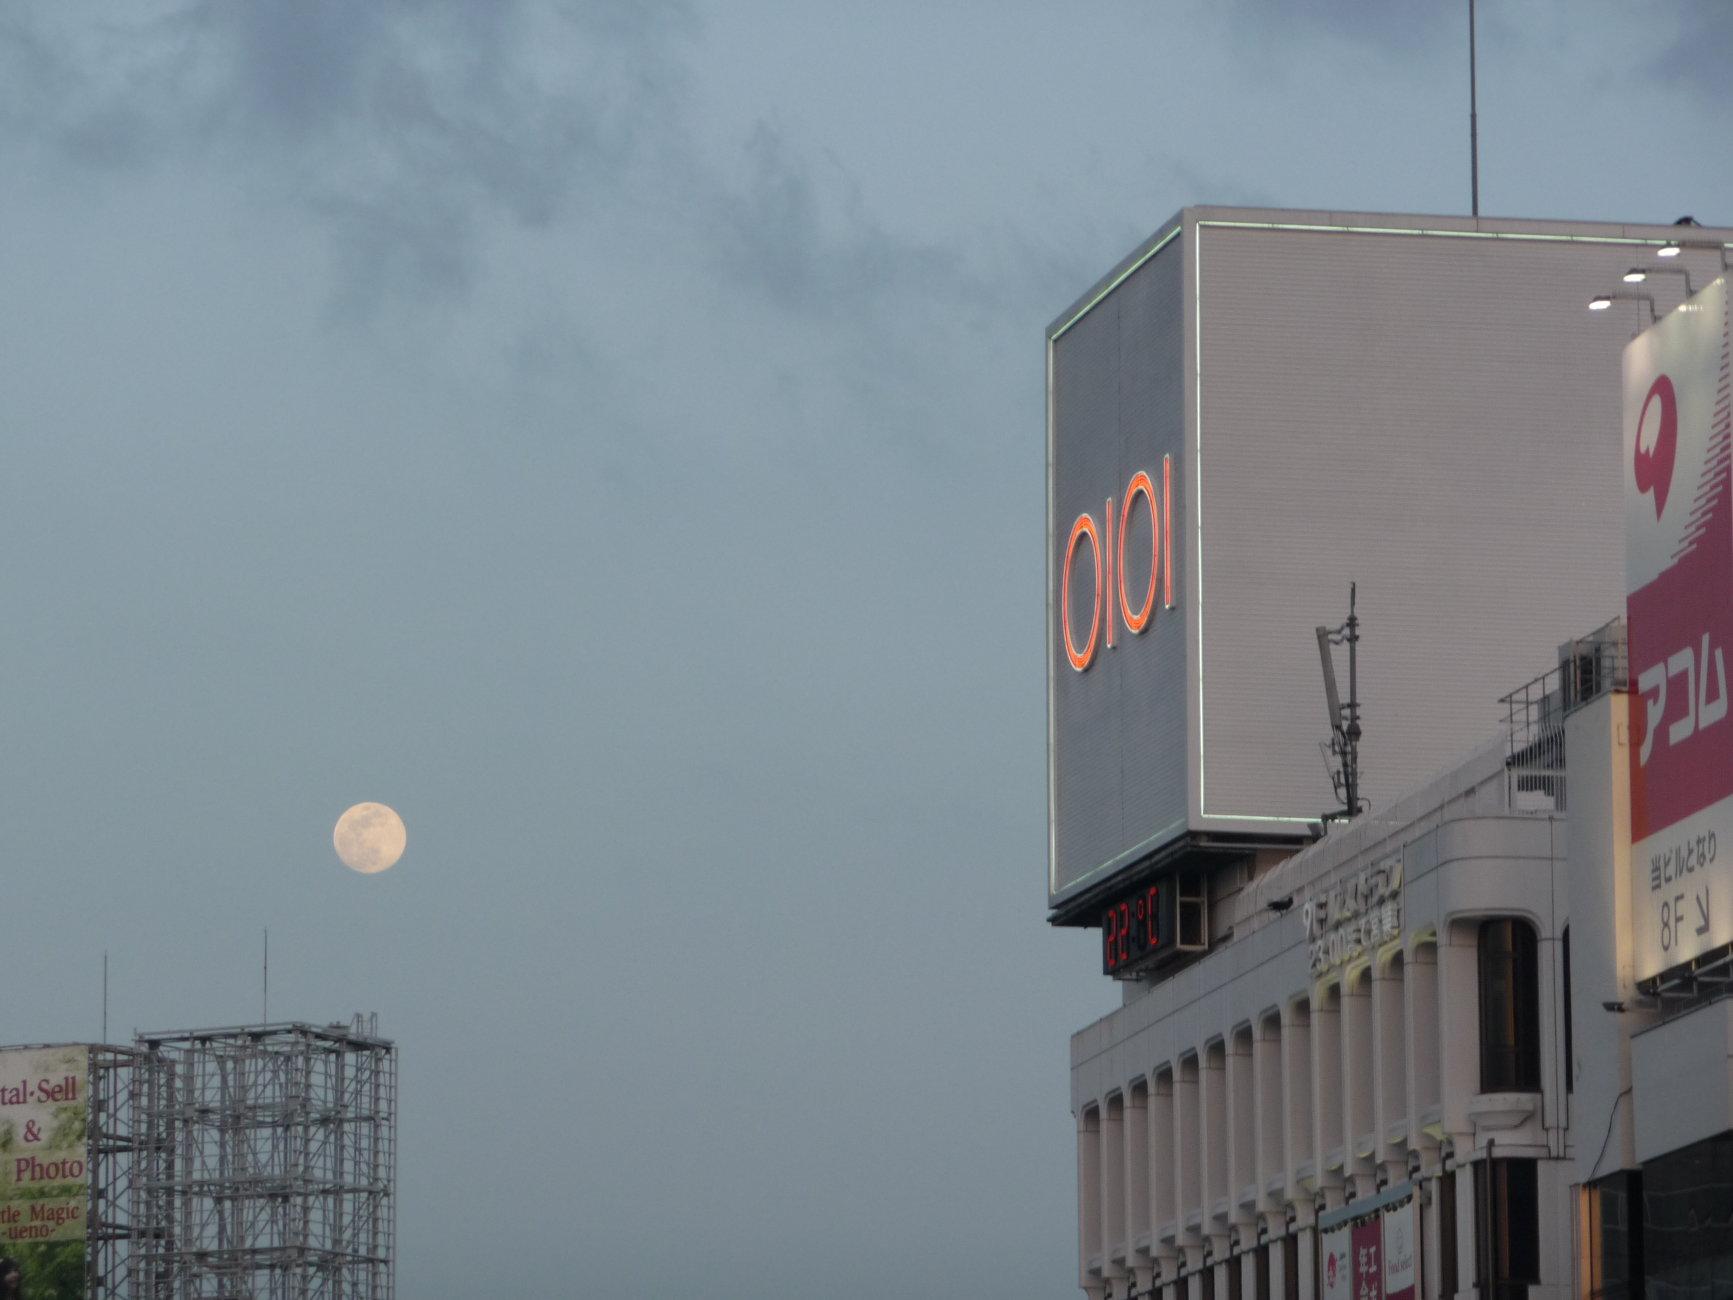 Full moon over Kyoto